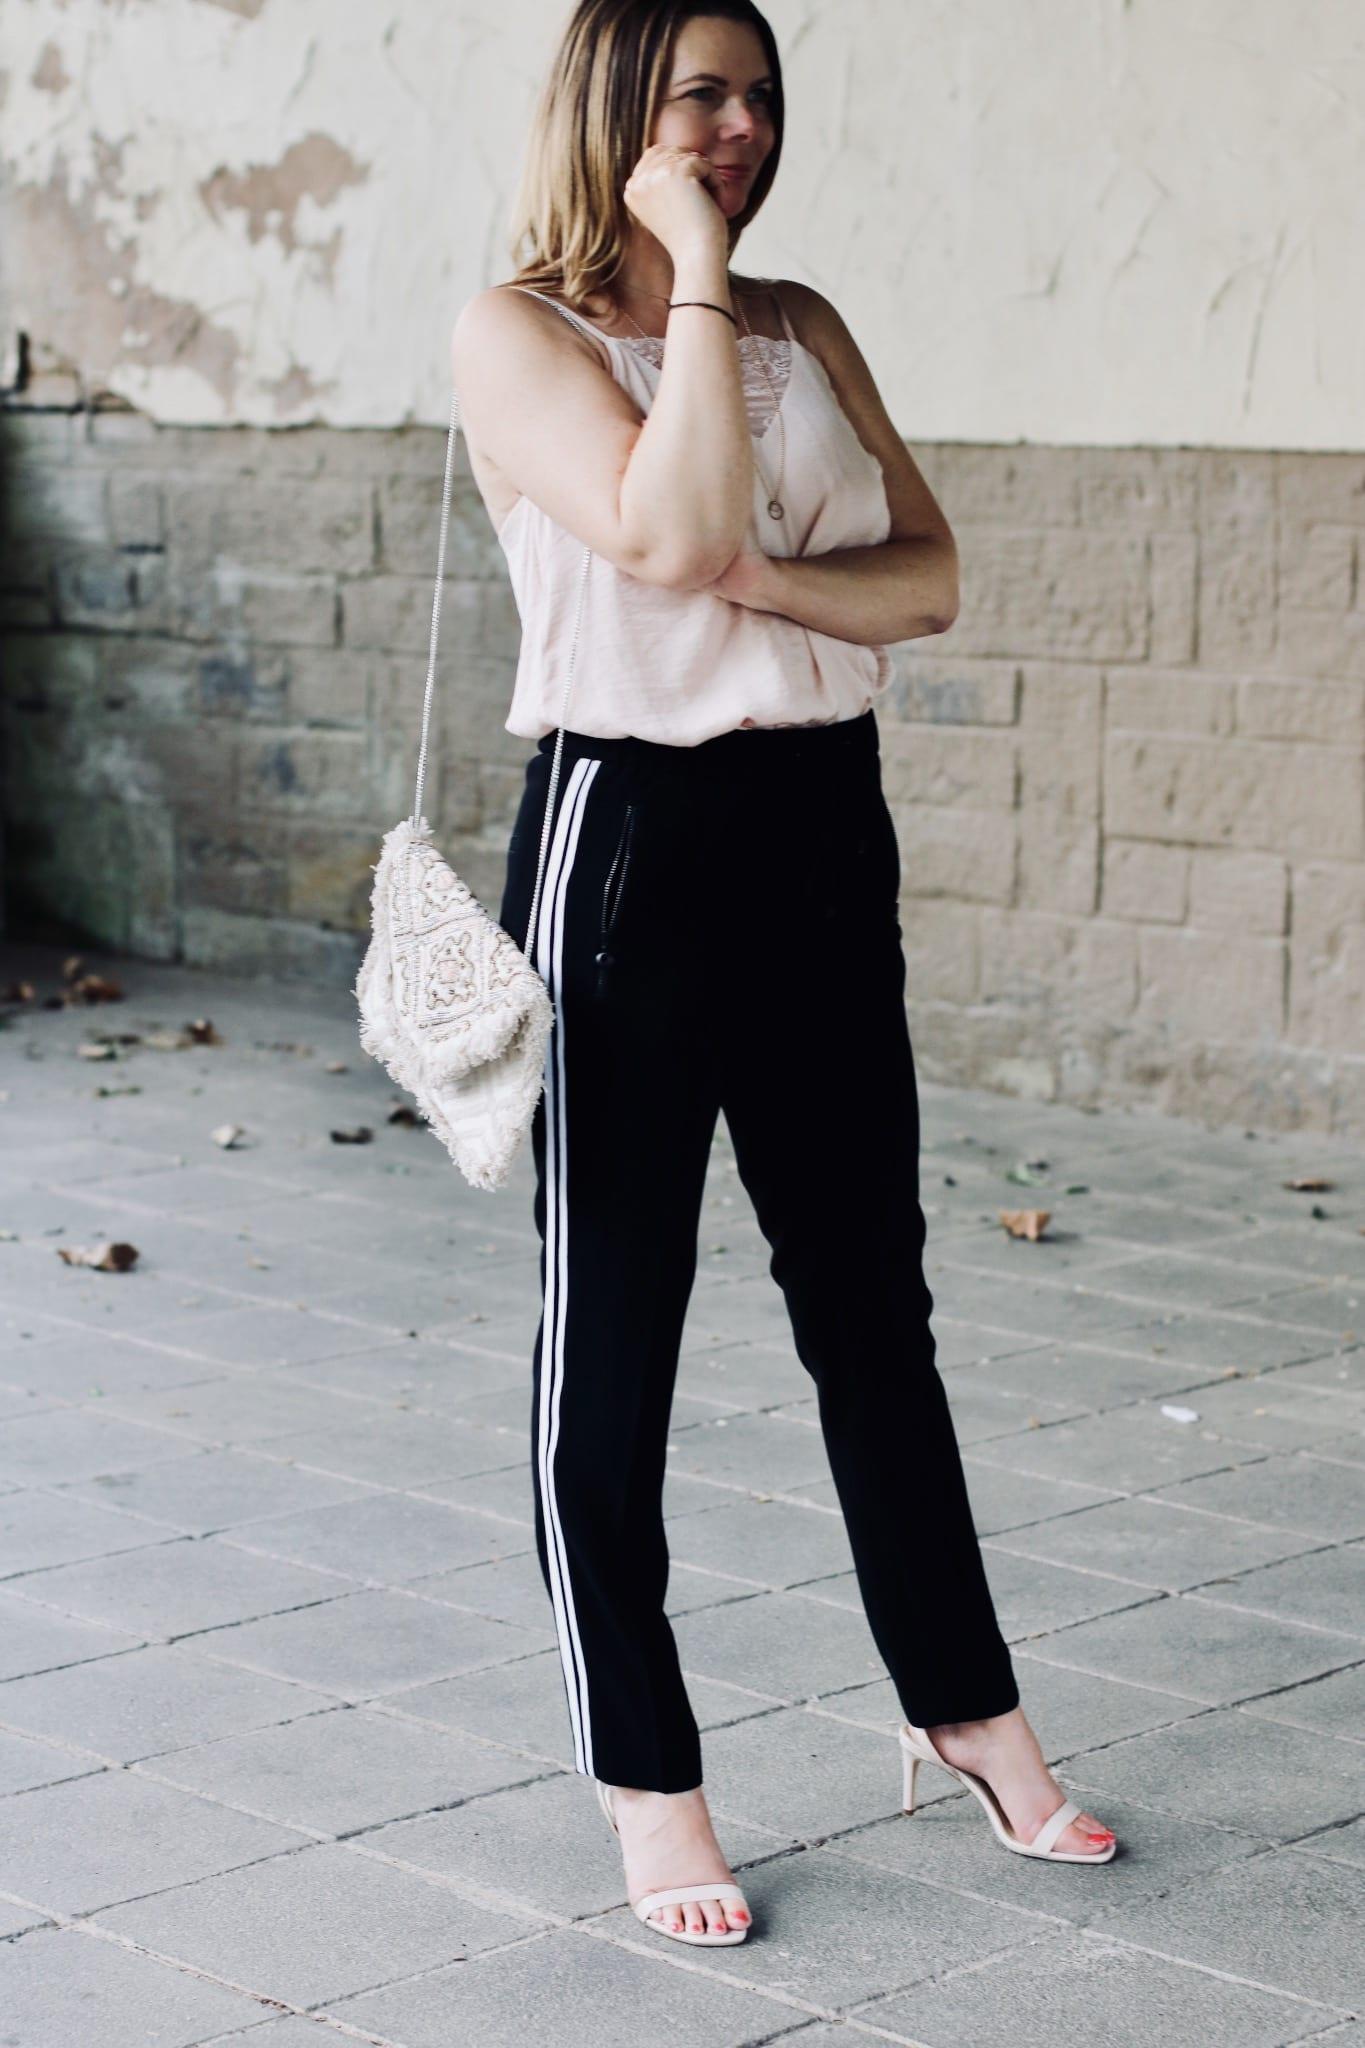 Ü40 Lifestyle Bloggerin